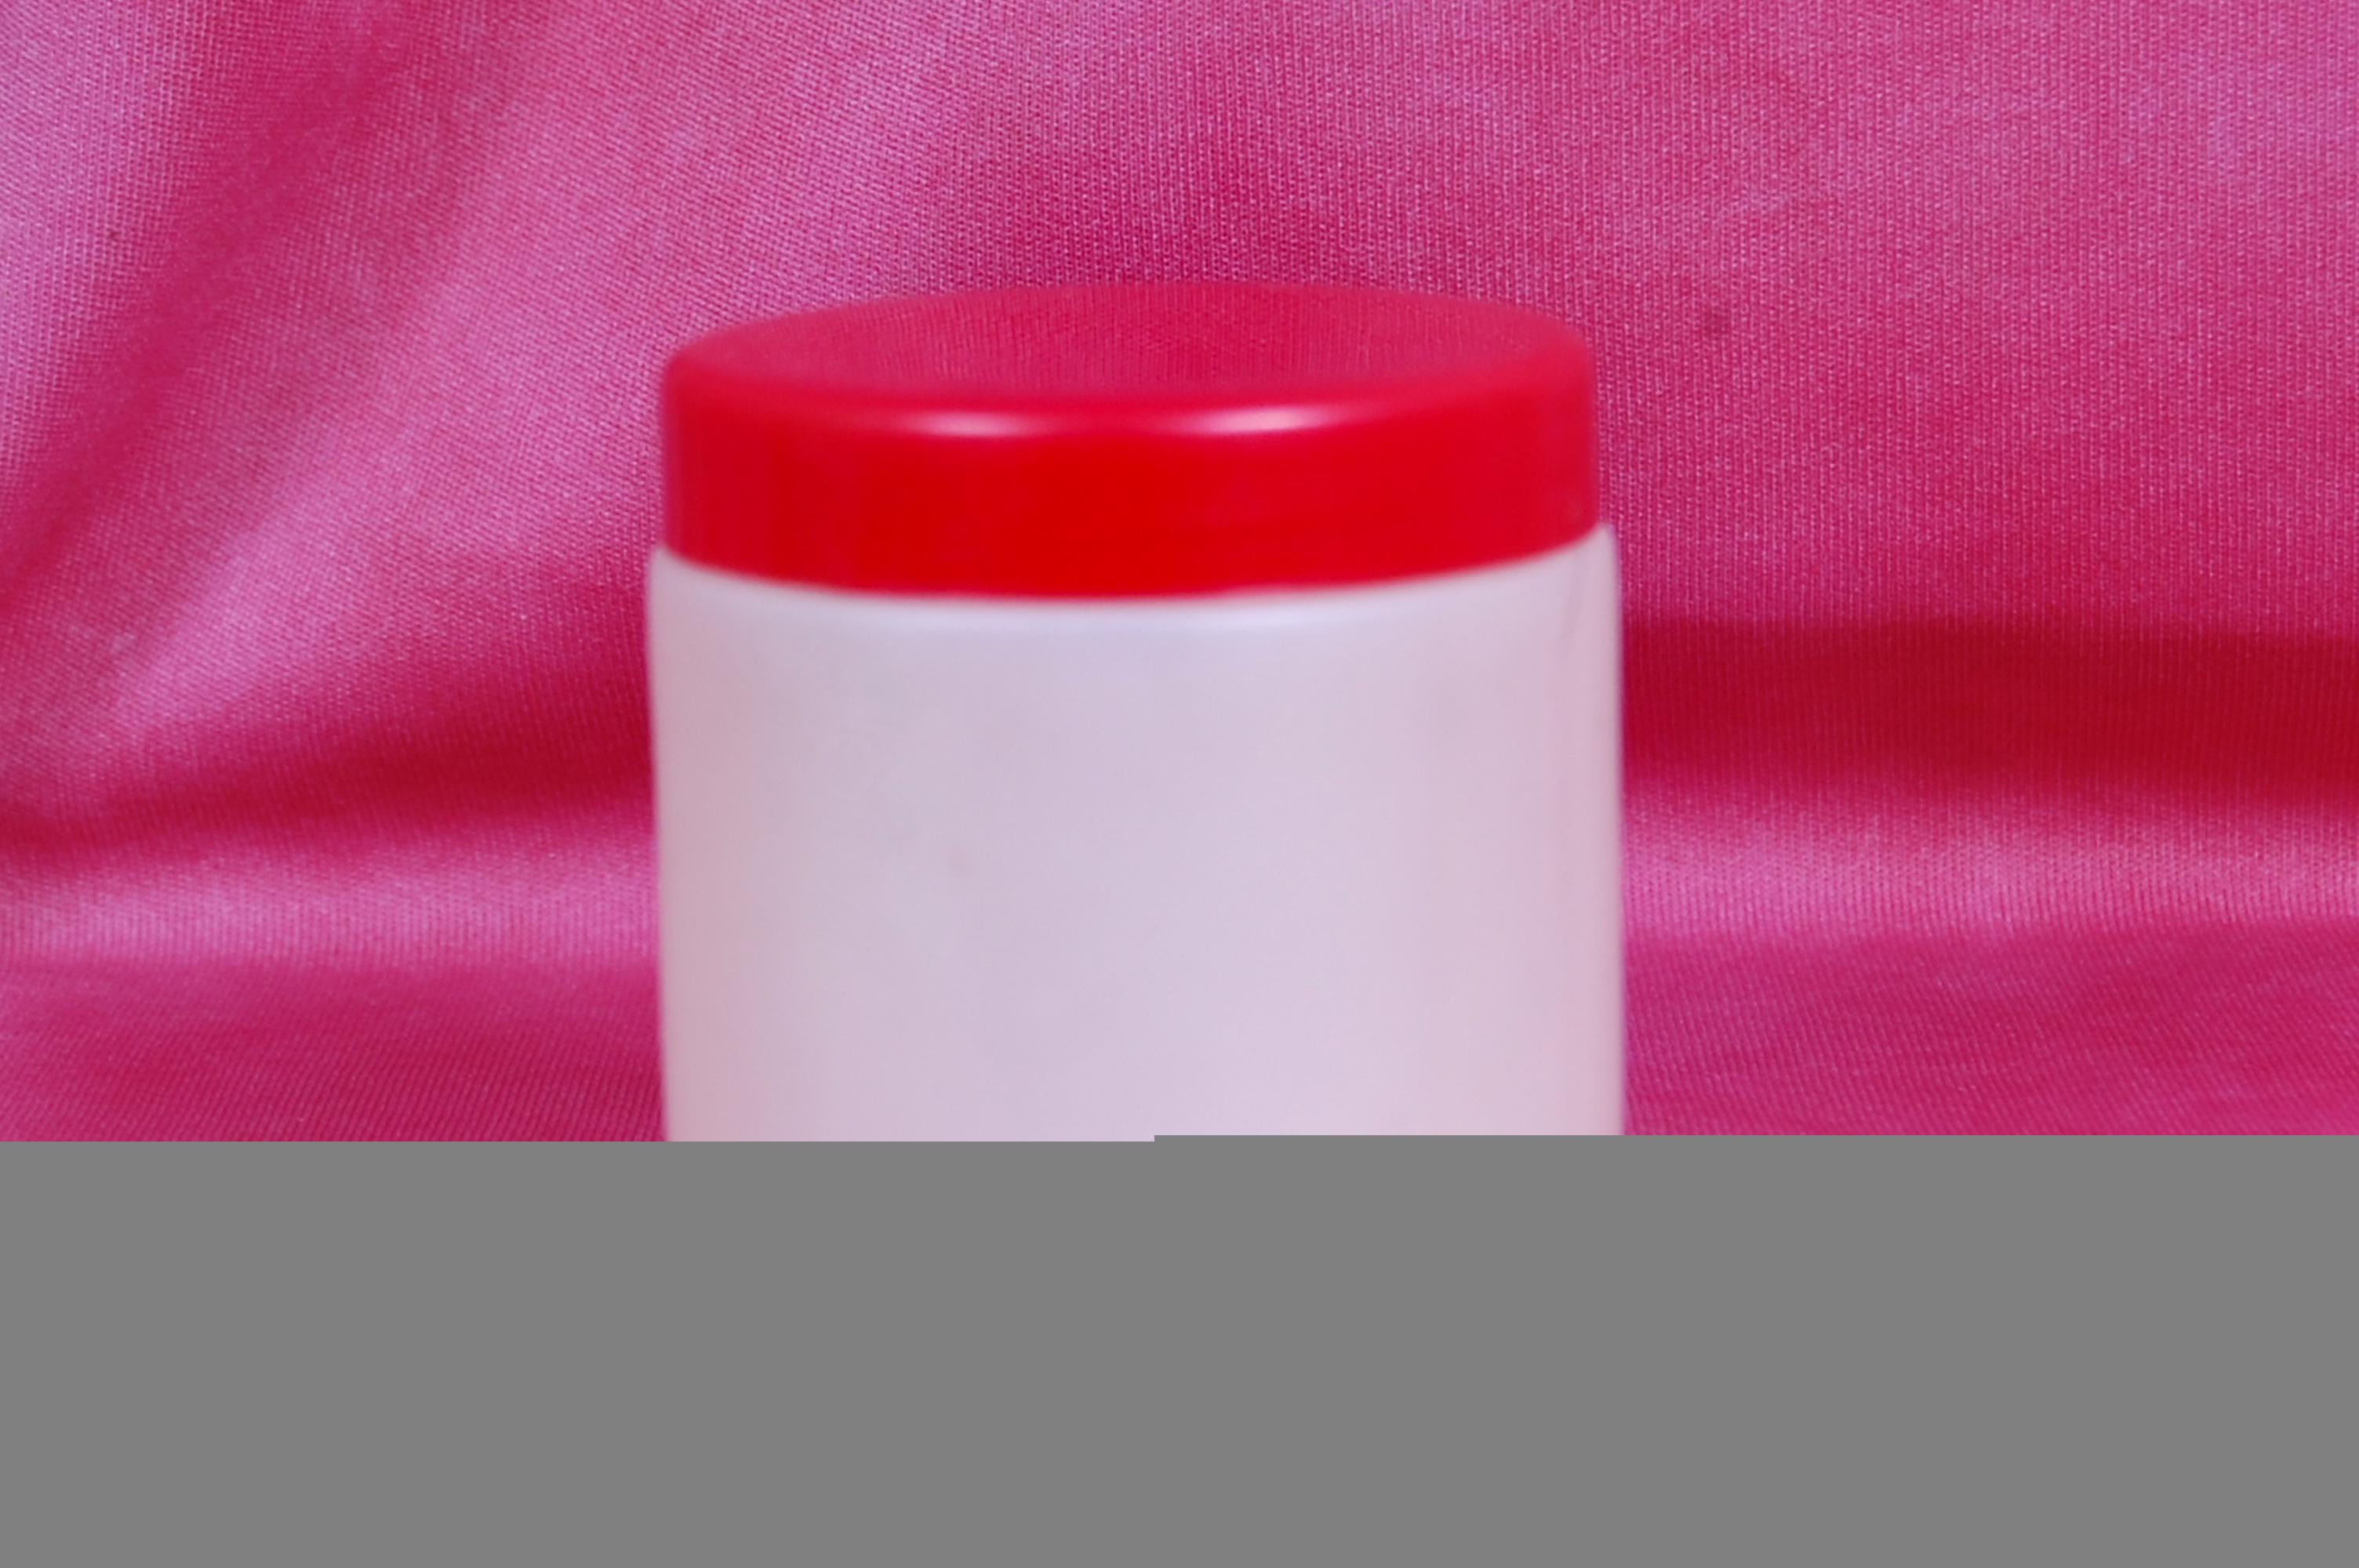 Double Wall Cream Jar